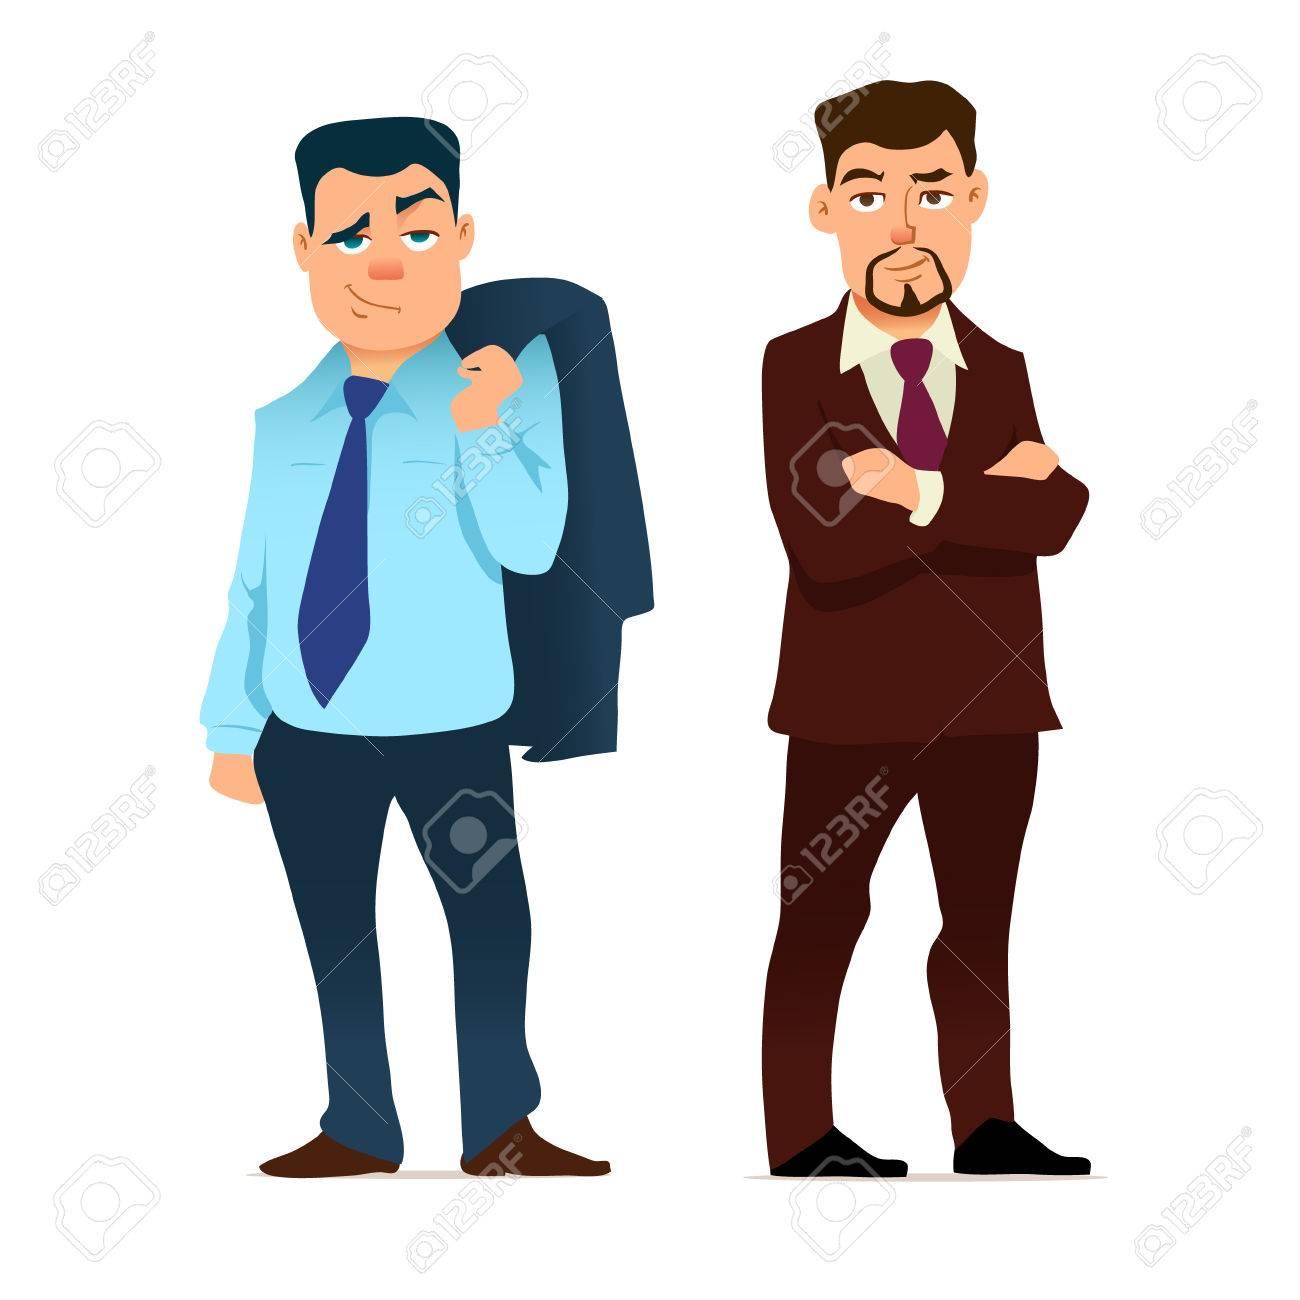 business people cartoon illustration businessman in various